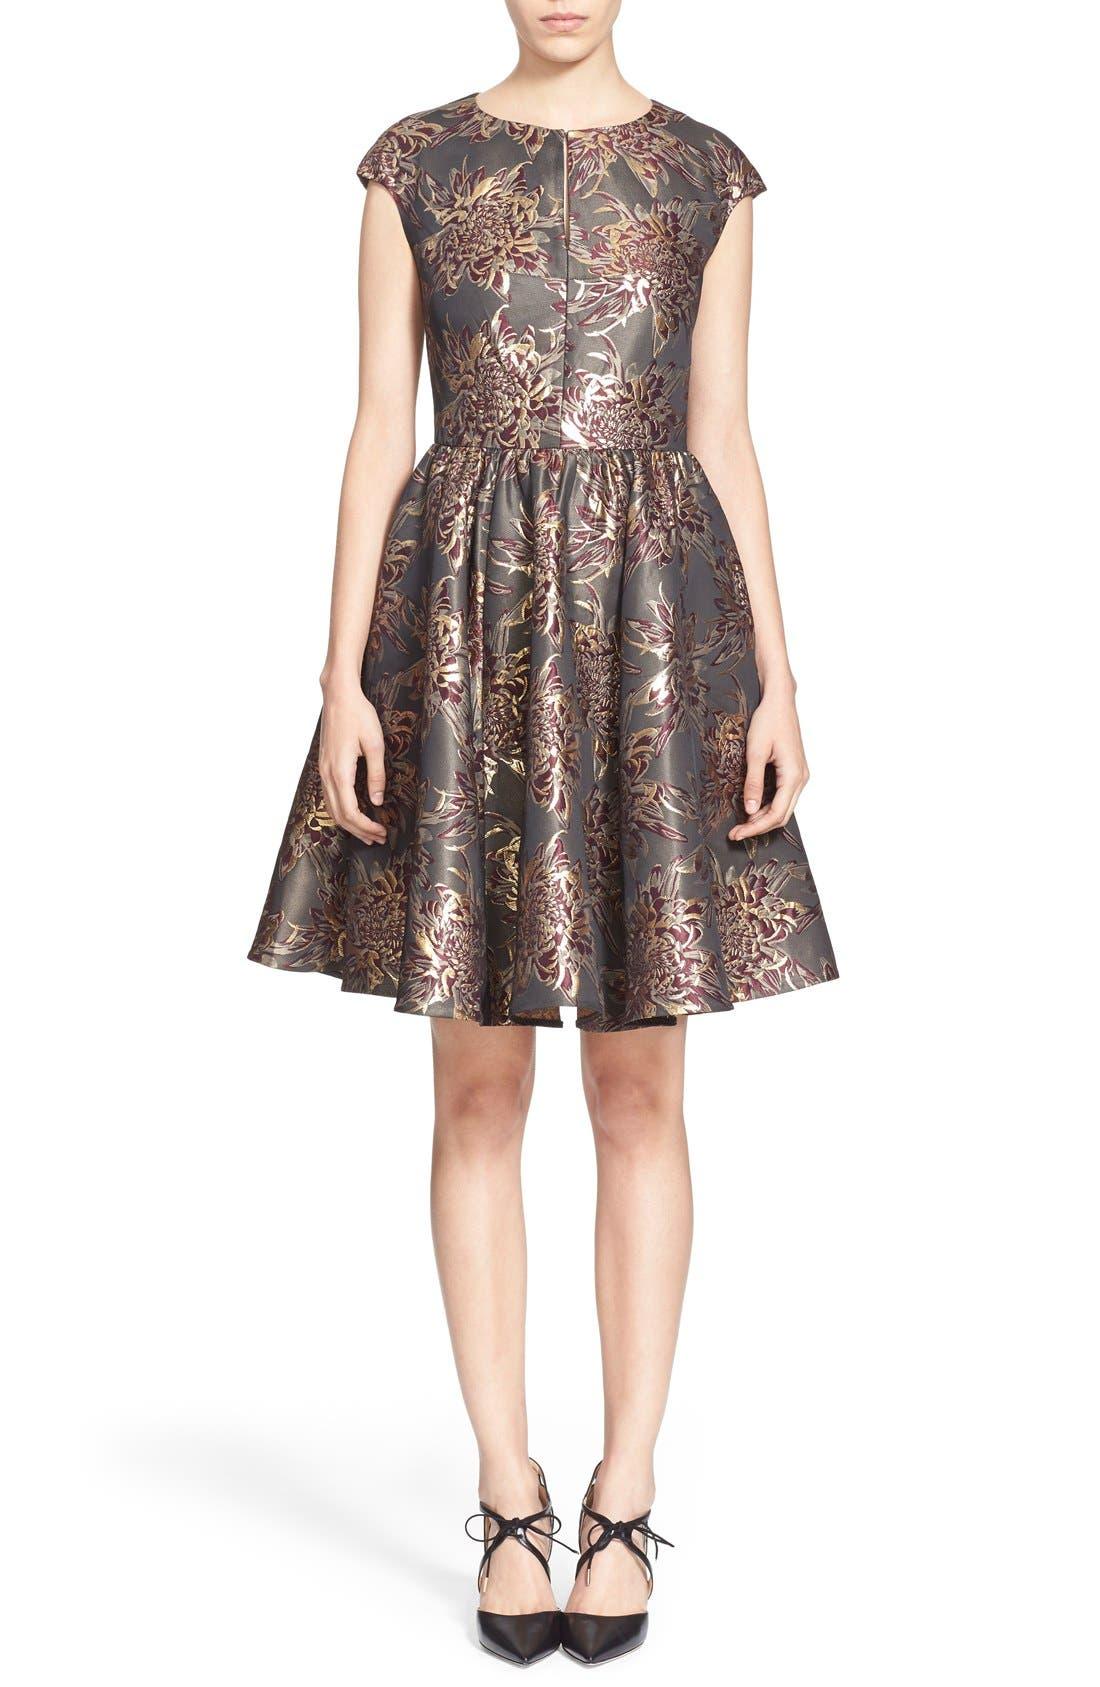 Alternate Image 1 Selected - Ted Baker London 'Laurey' Metallic Floral Jacquard Fit & Flare Dress